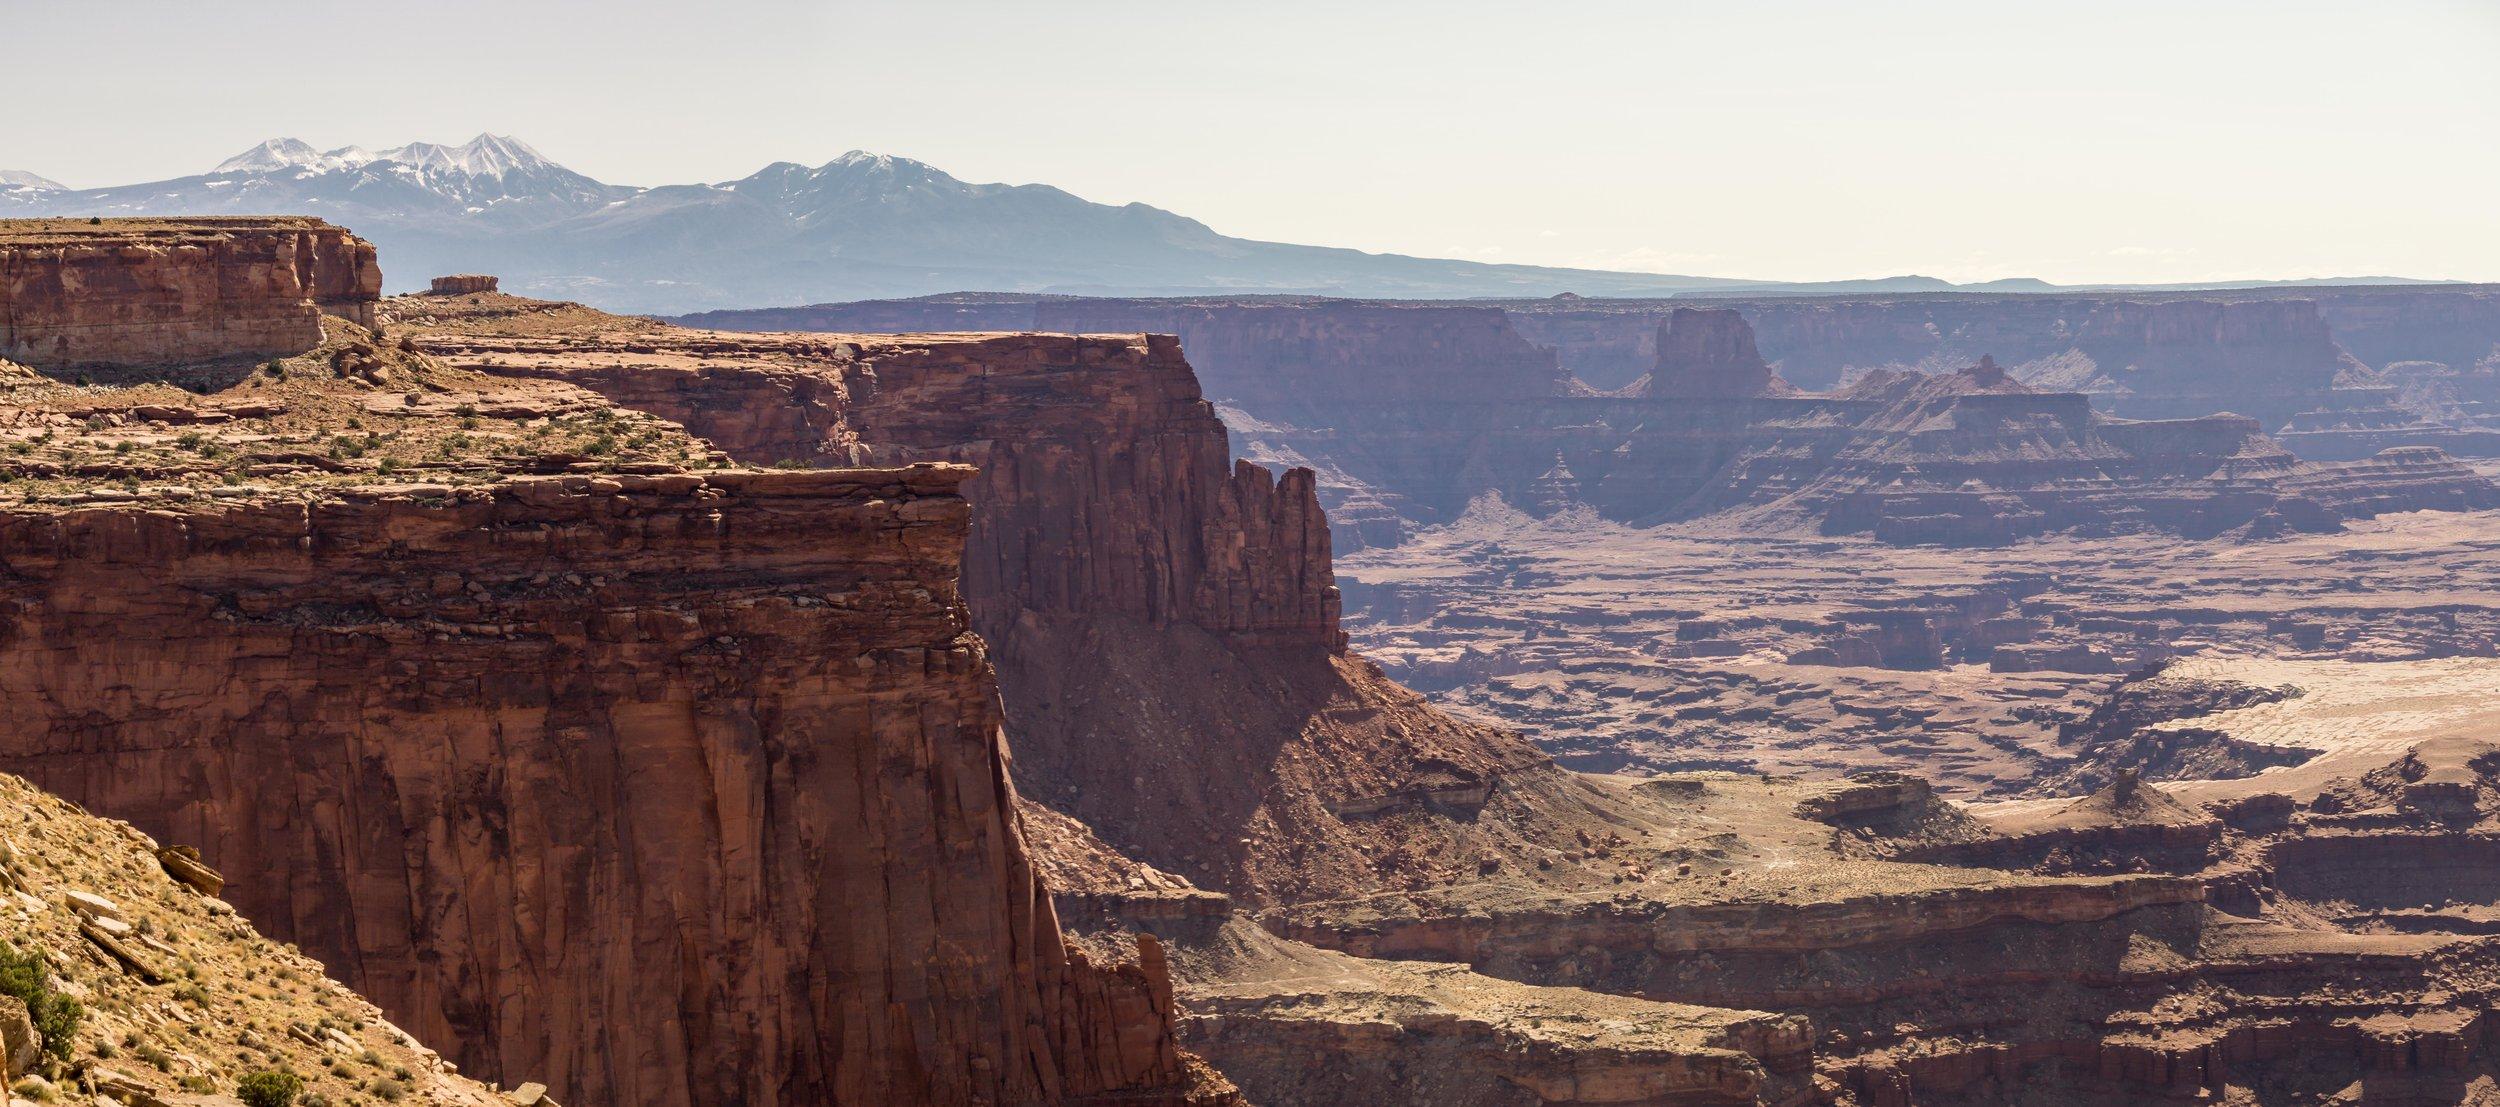 CanyonlandsApril2018-12.jpg